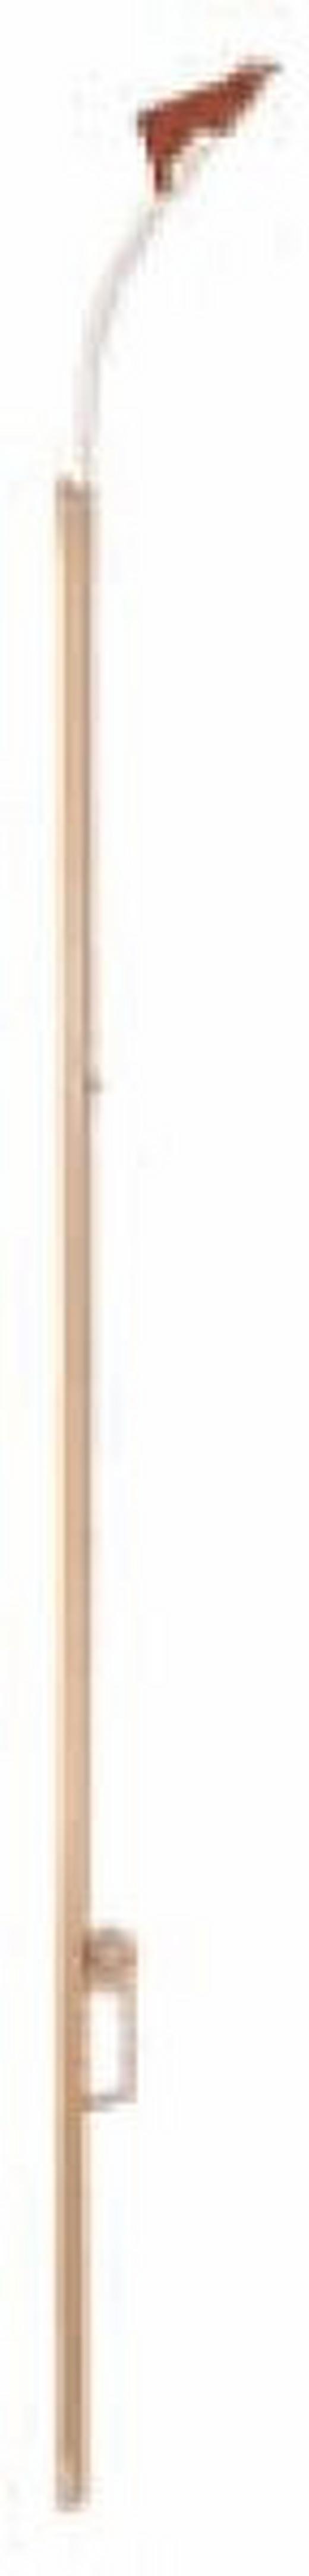 LIFTSTAB 150 cm - Braun, Basics, Holz/Kunststoff (150cm) - Homeware